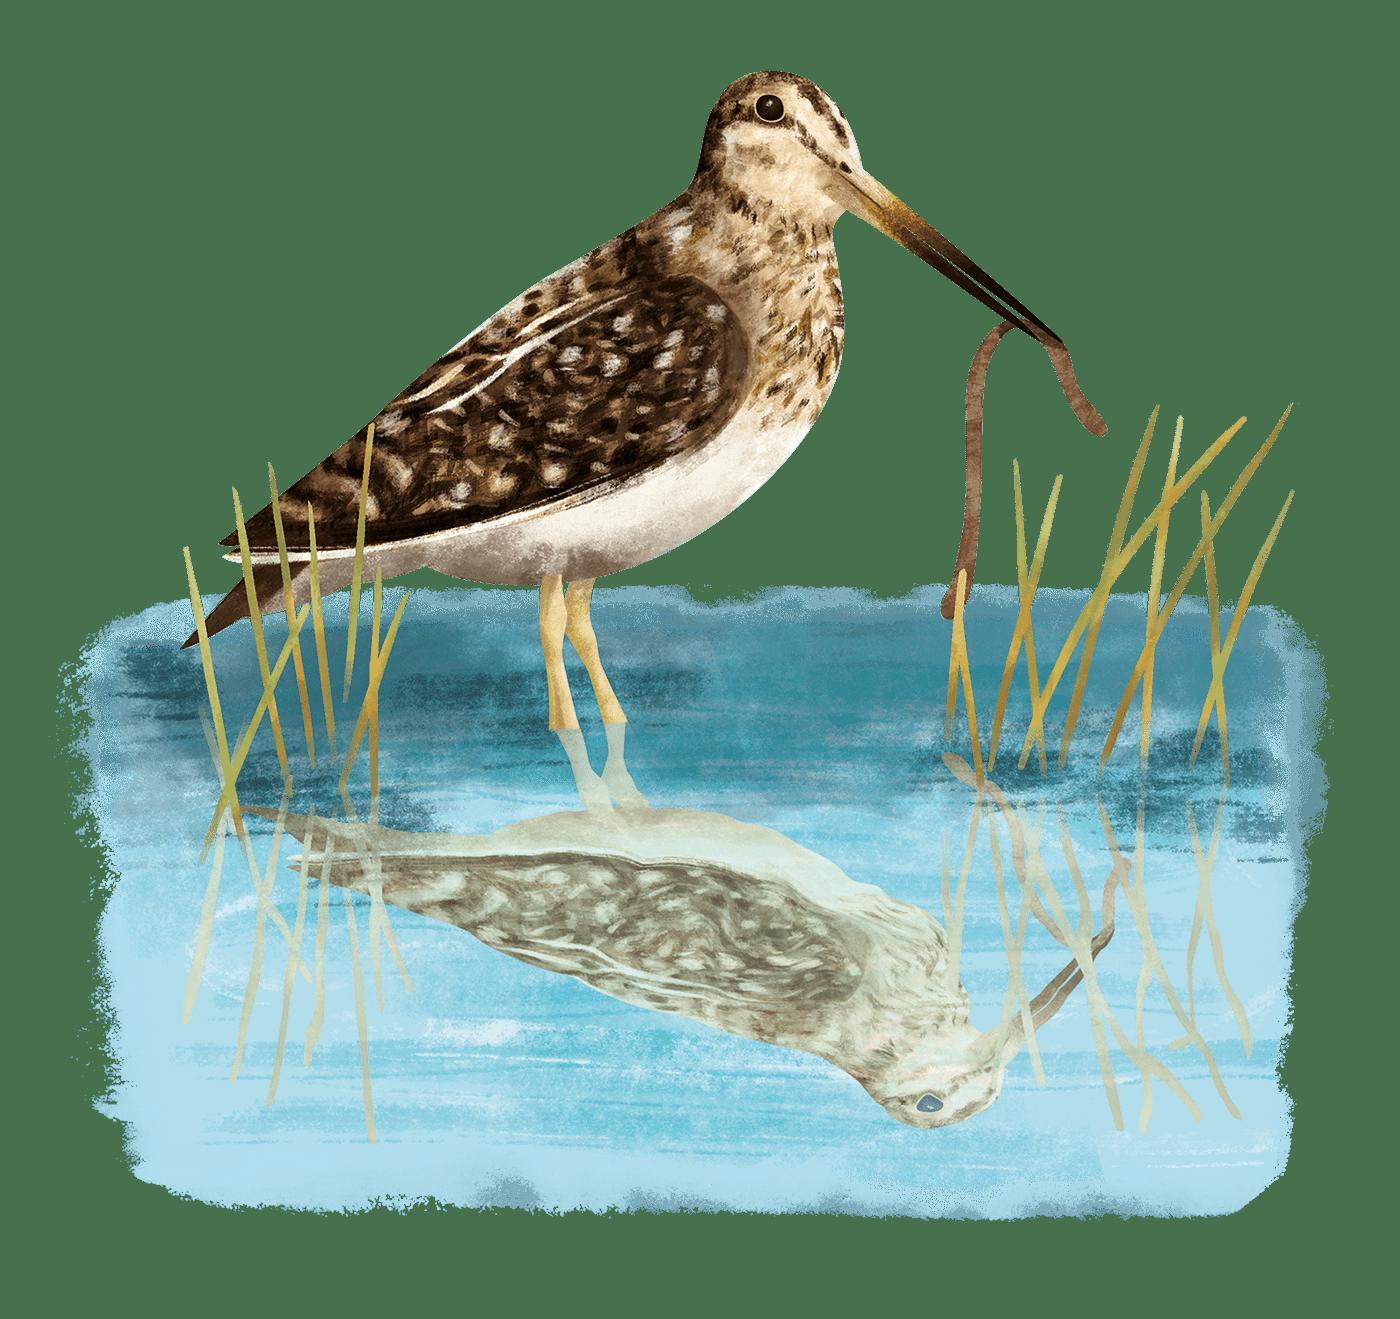 Bird Illustration birds book book cover book illustrations children book Encyclopedia Nature illustrations picturebook slovak illustration